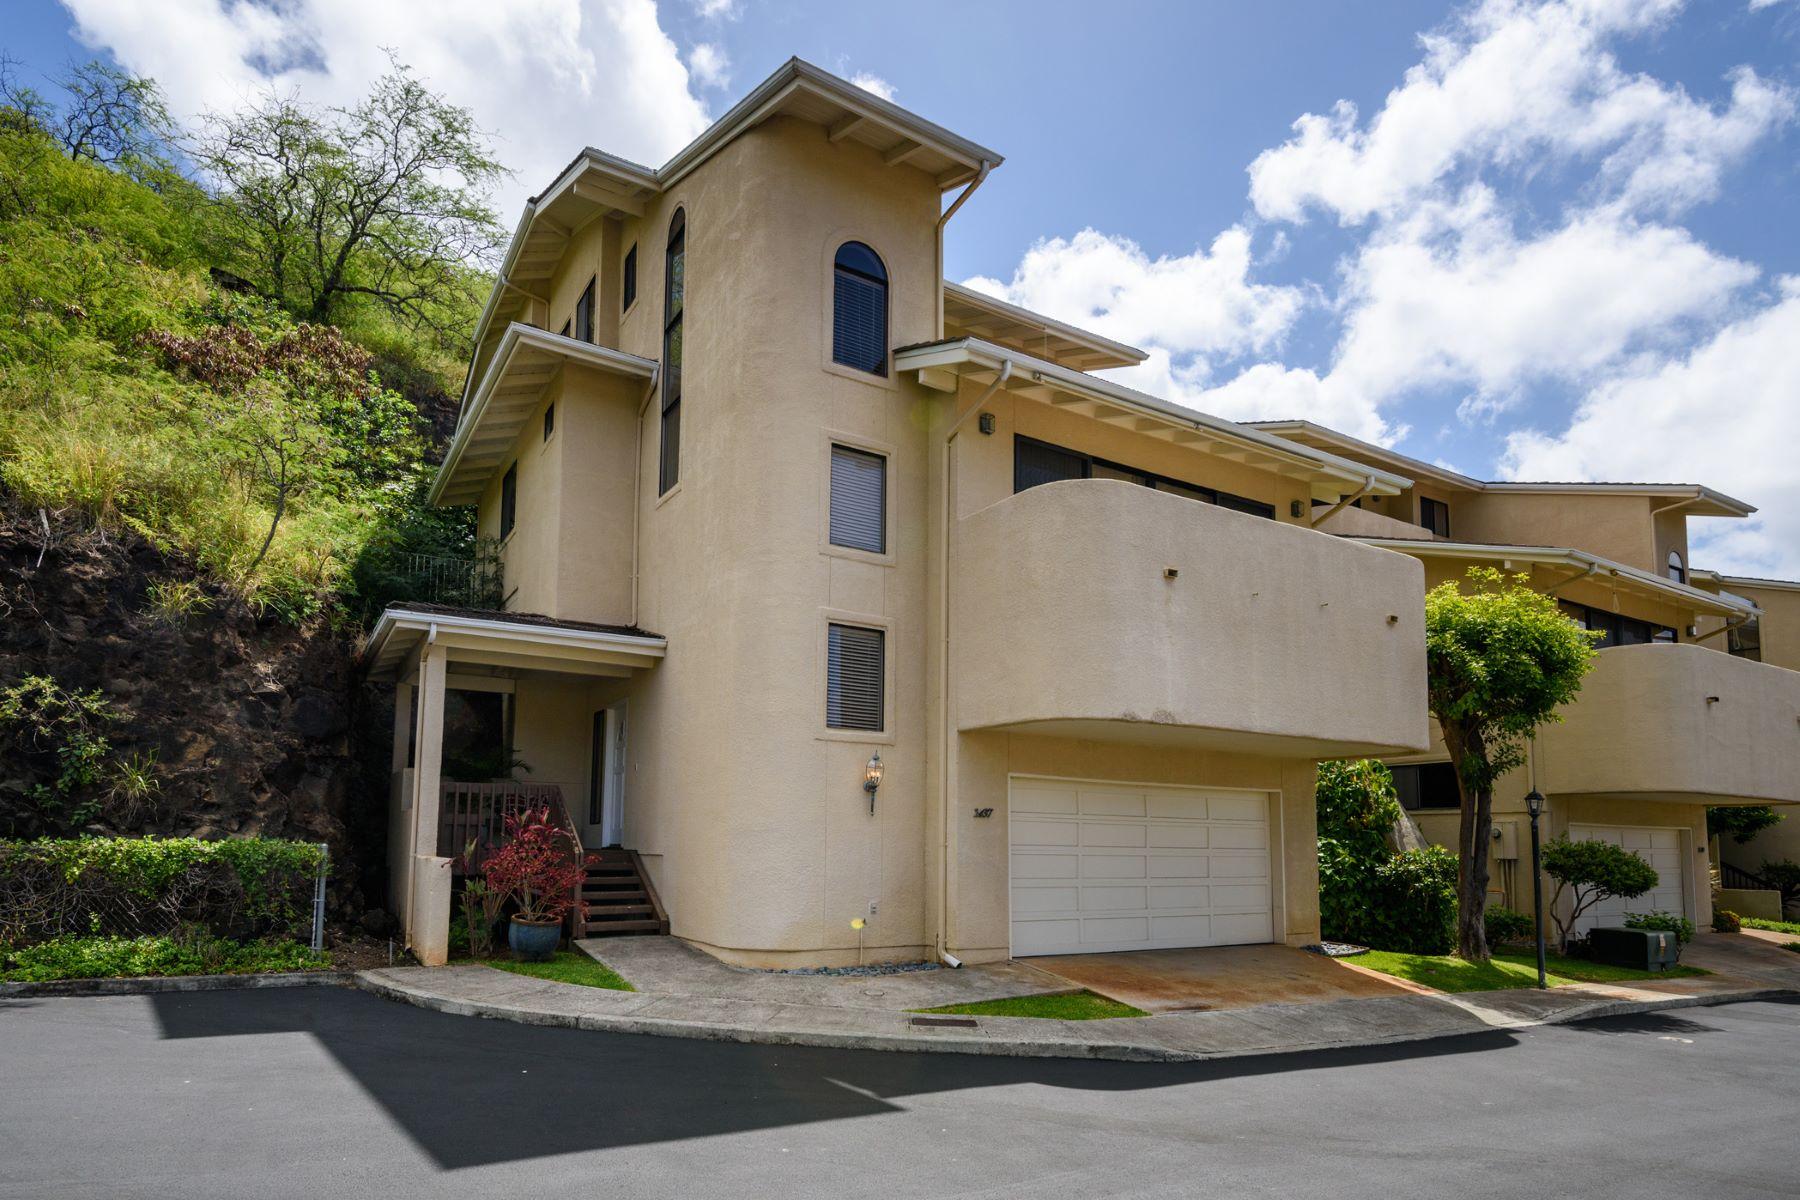 Single Family Home for Sale at Exclusive Kalani Iki Hideaway 1437 Hoakoa Place #10 Kalani Iki, Honolulu, Hawaii, 96821 United States